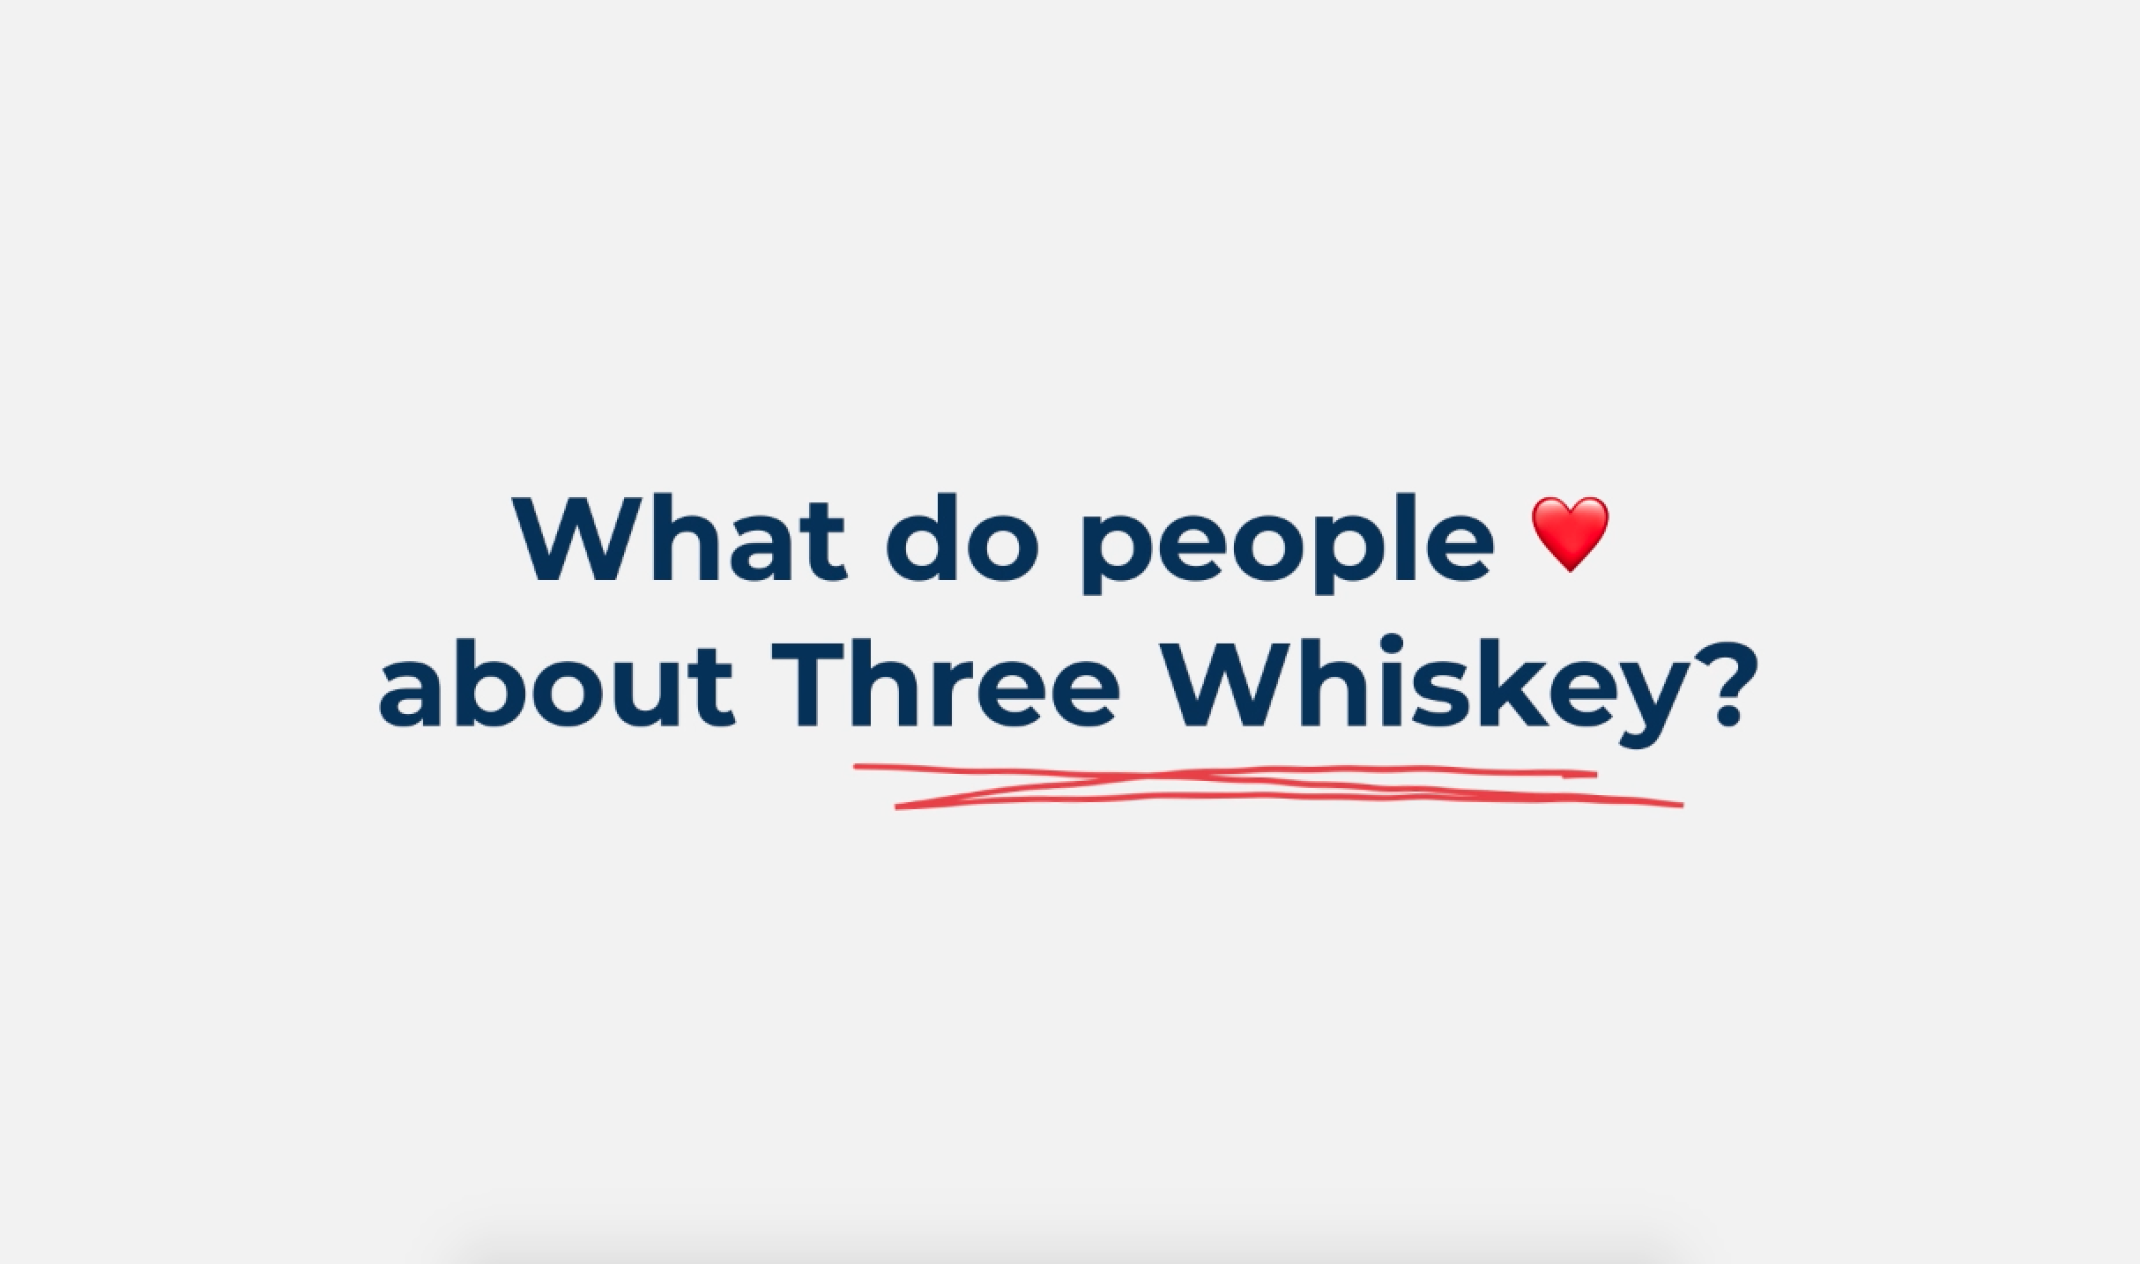 Working at Three Whiskey